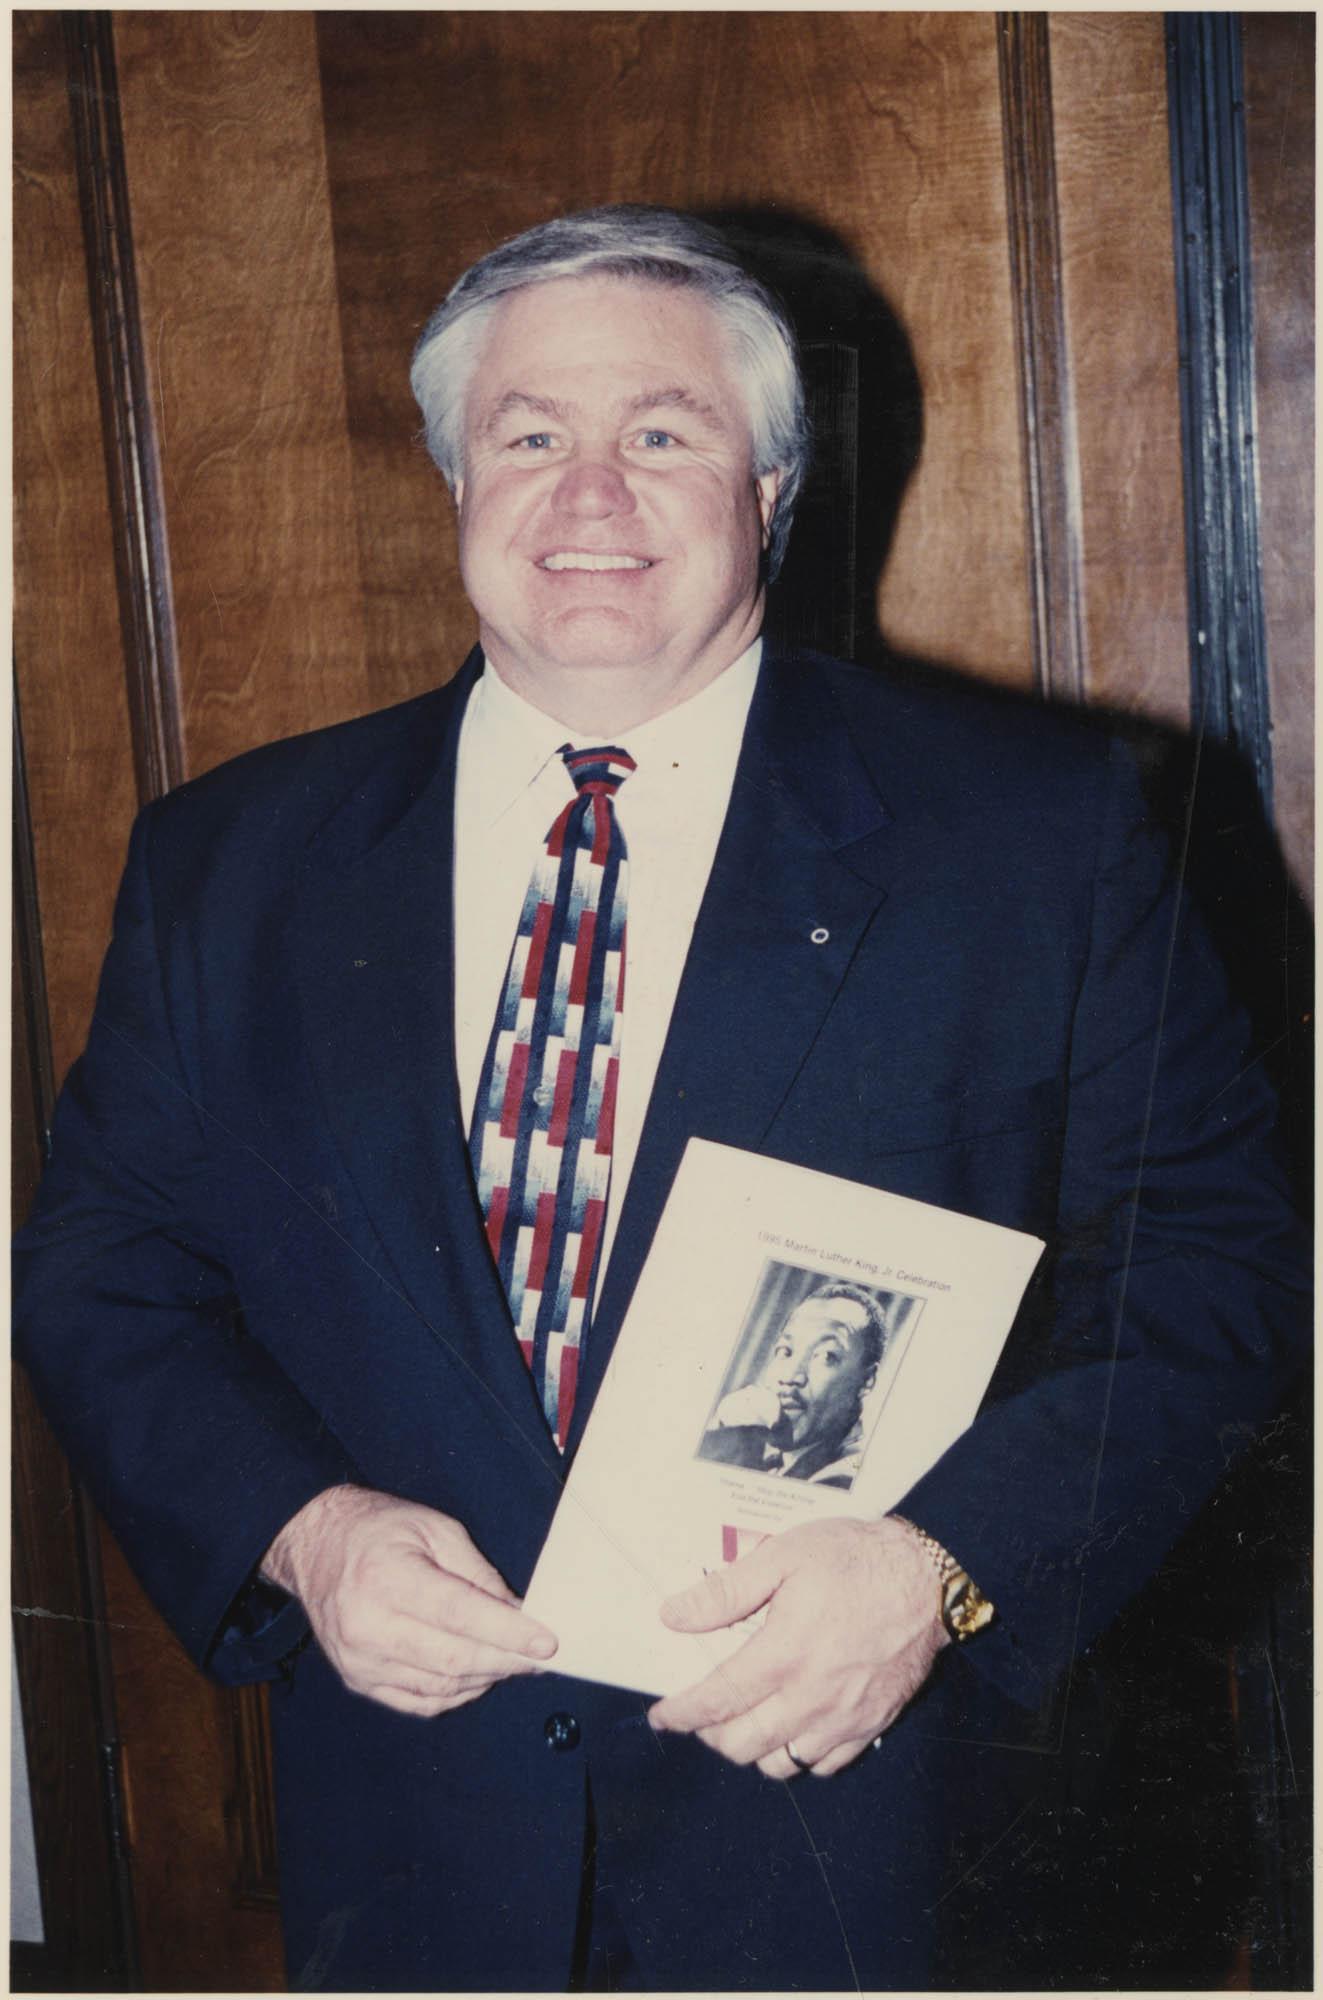 Photograph of Keith Summey